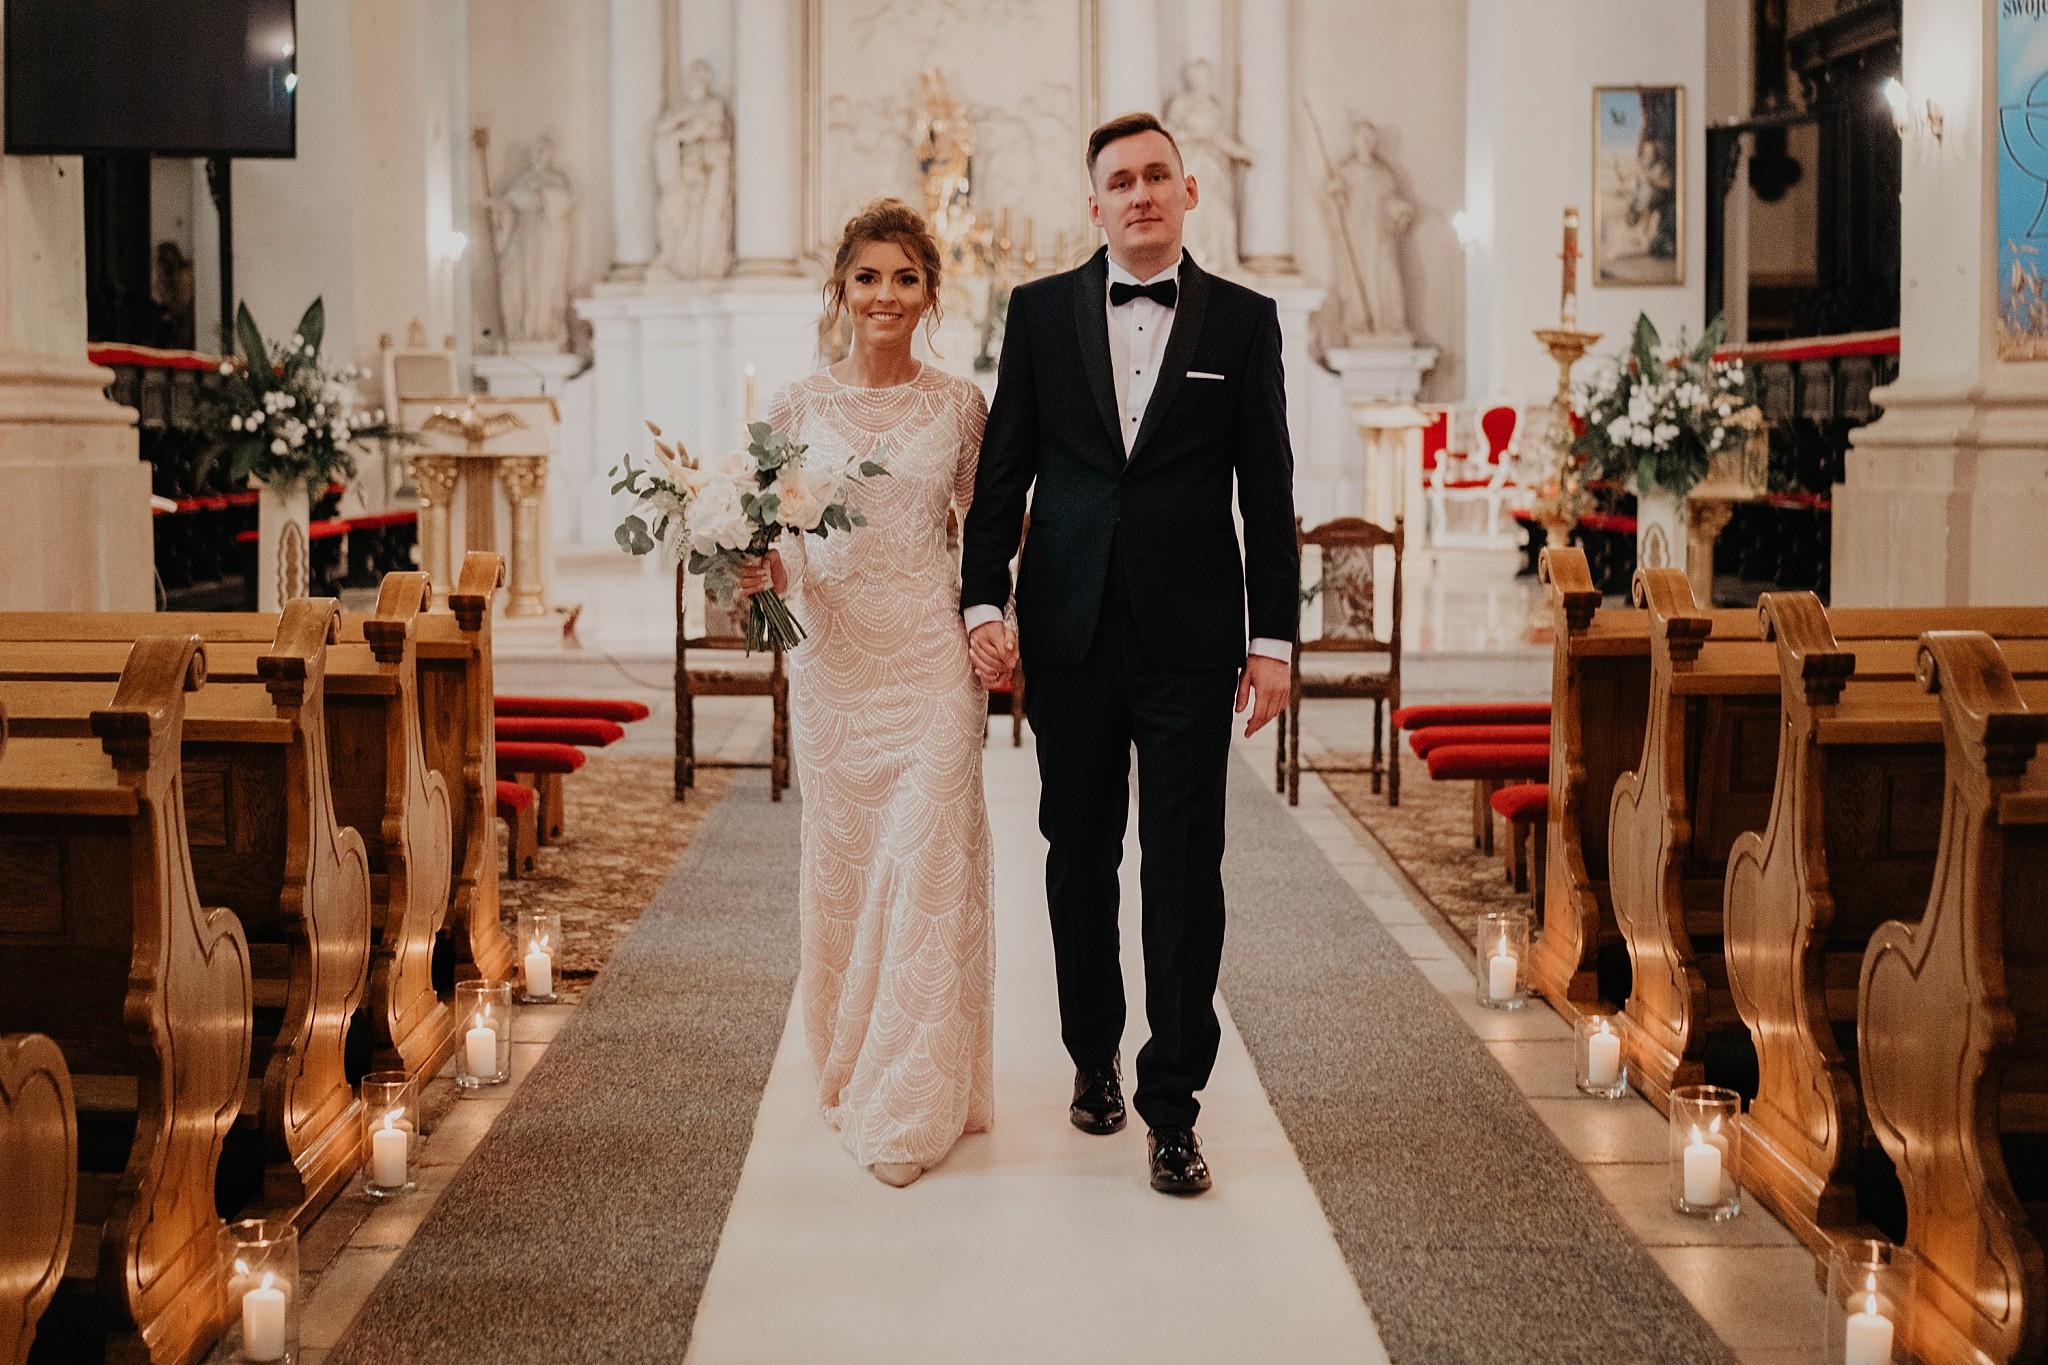 fotograf poznan wesele dobra truskawka piekne wesele pod poznaniem wesele w dobrej truskawce piekna para mloda slub marzen slub koronawirus slub listopad wesele koronawirus 212